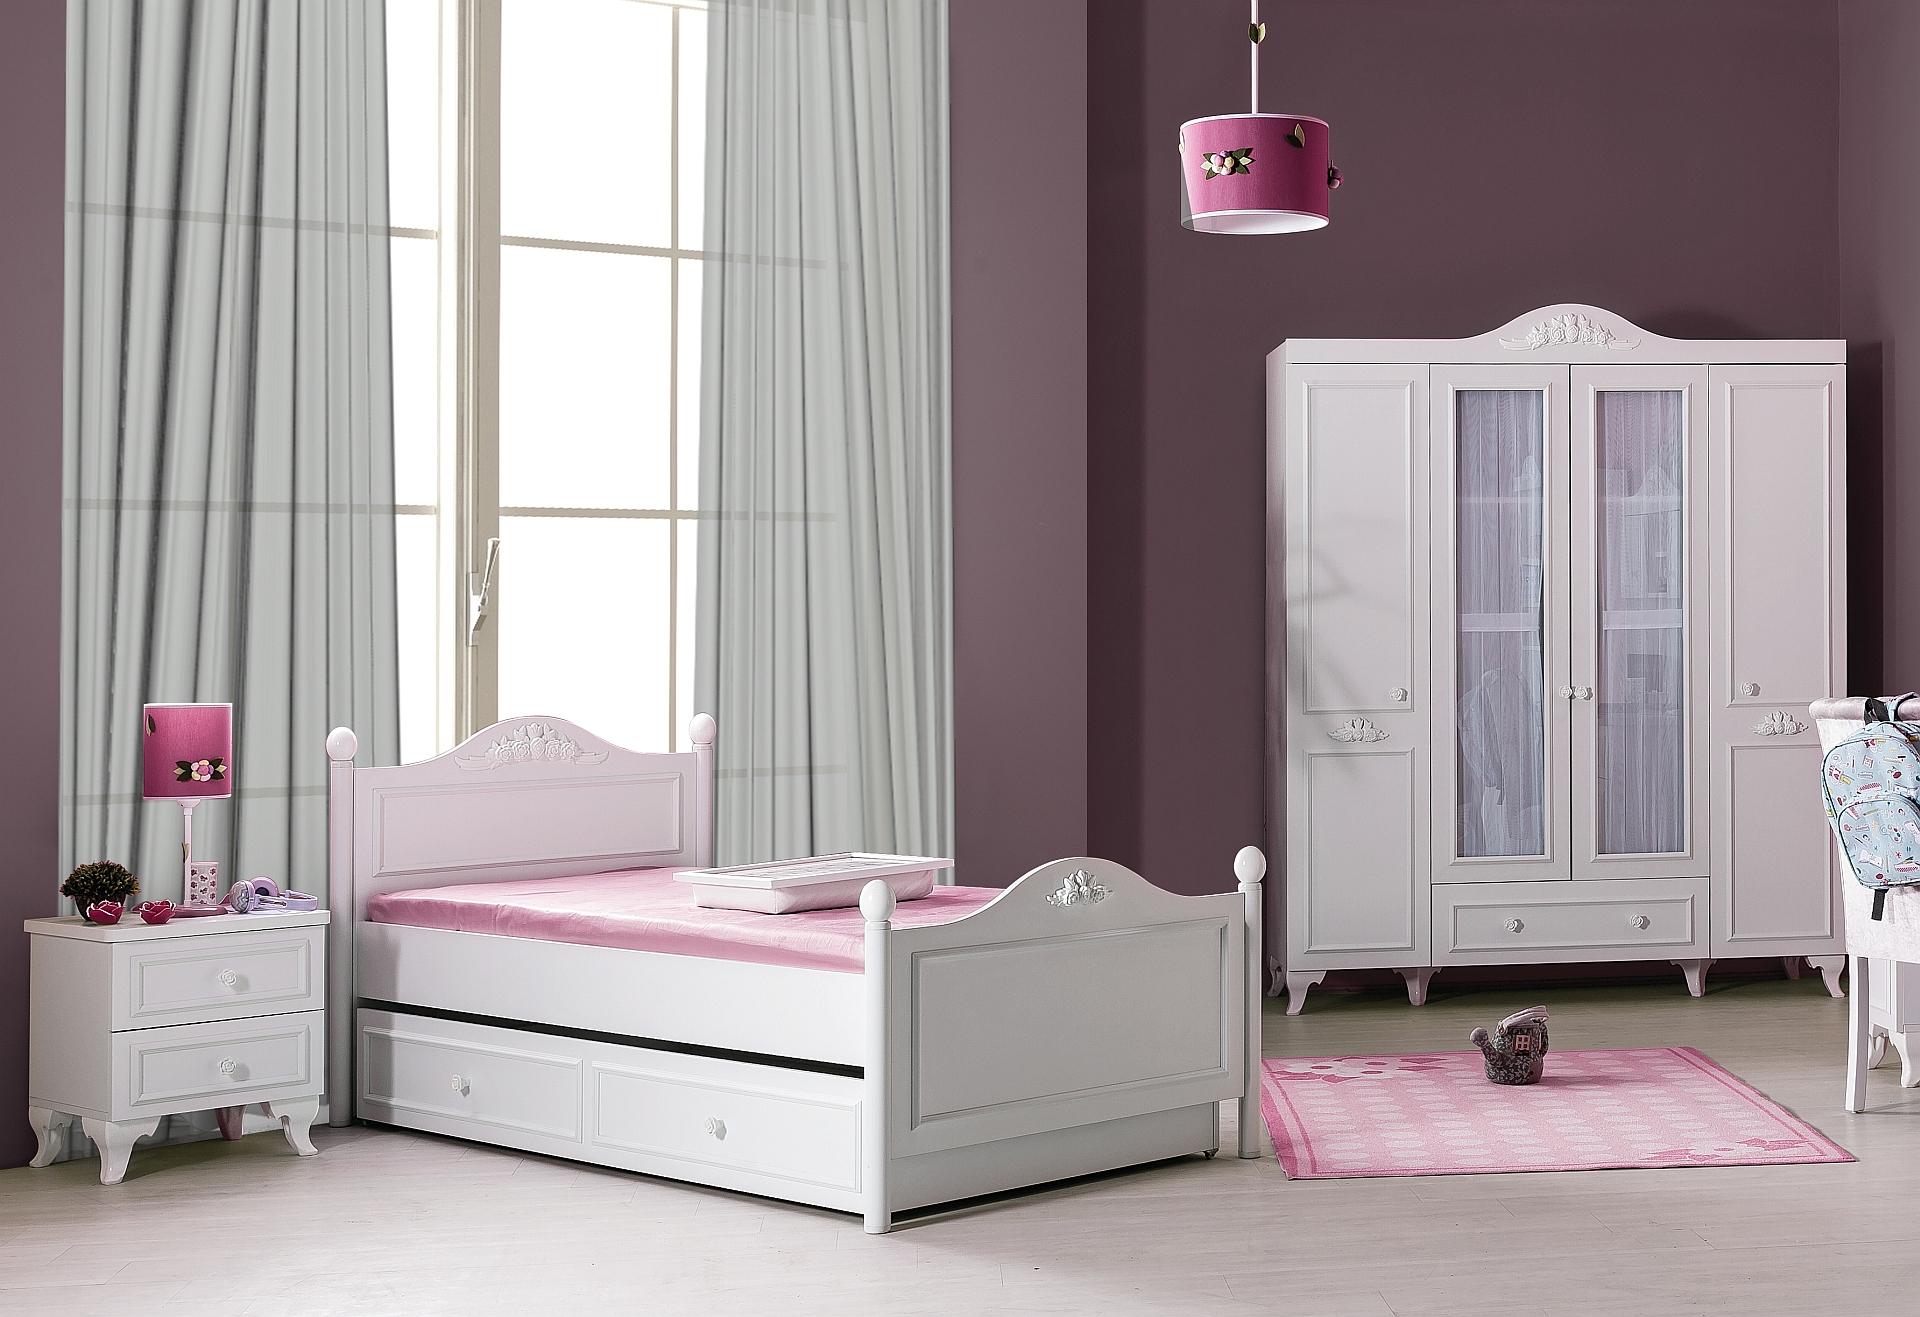 kinderzimmer komplett siena 5 weiss sparset 4 tlg traum m. Black Bedroom Furniture Sets. Home Design Ideas